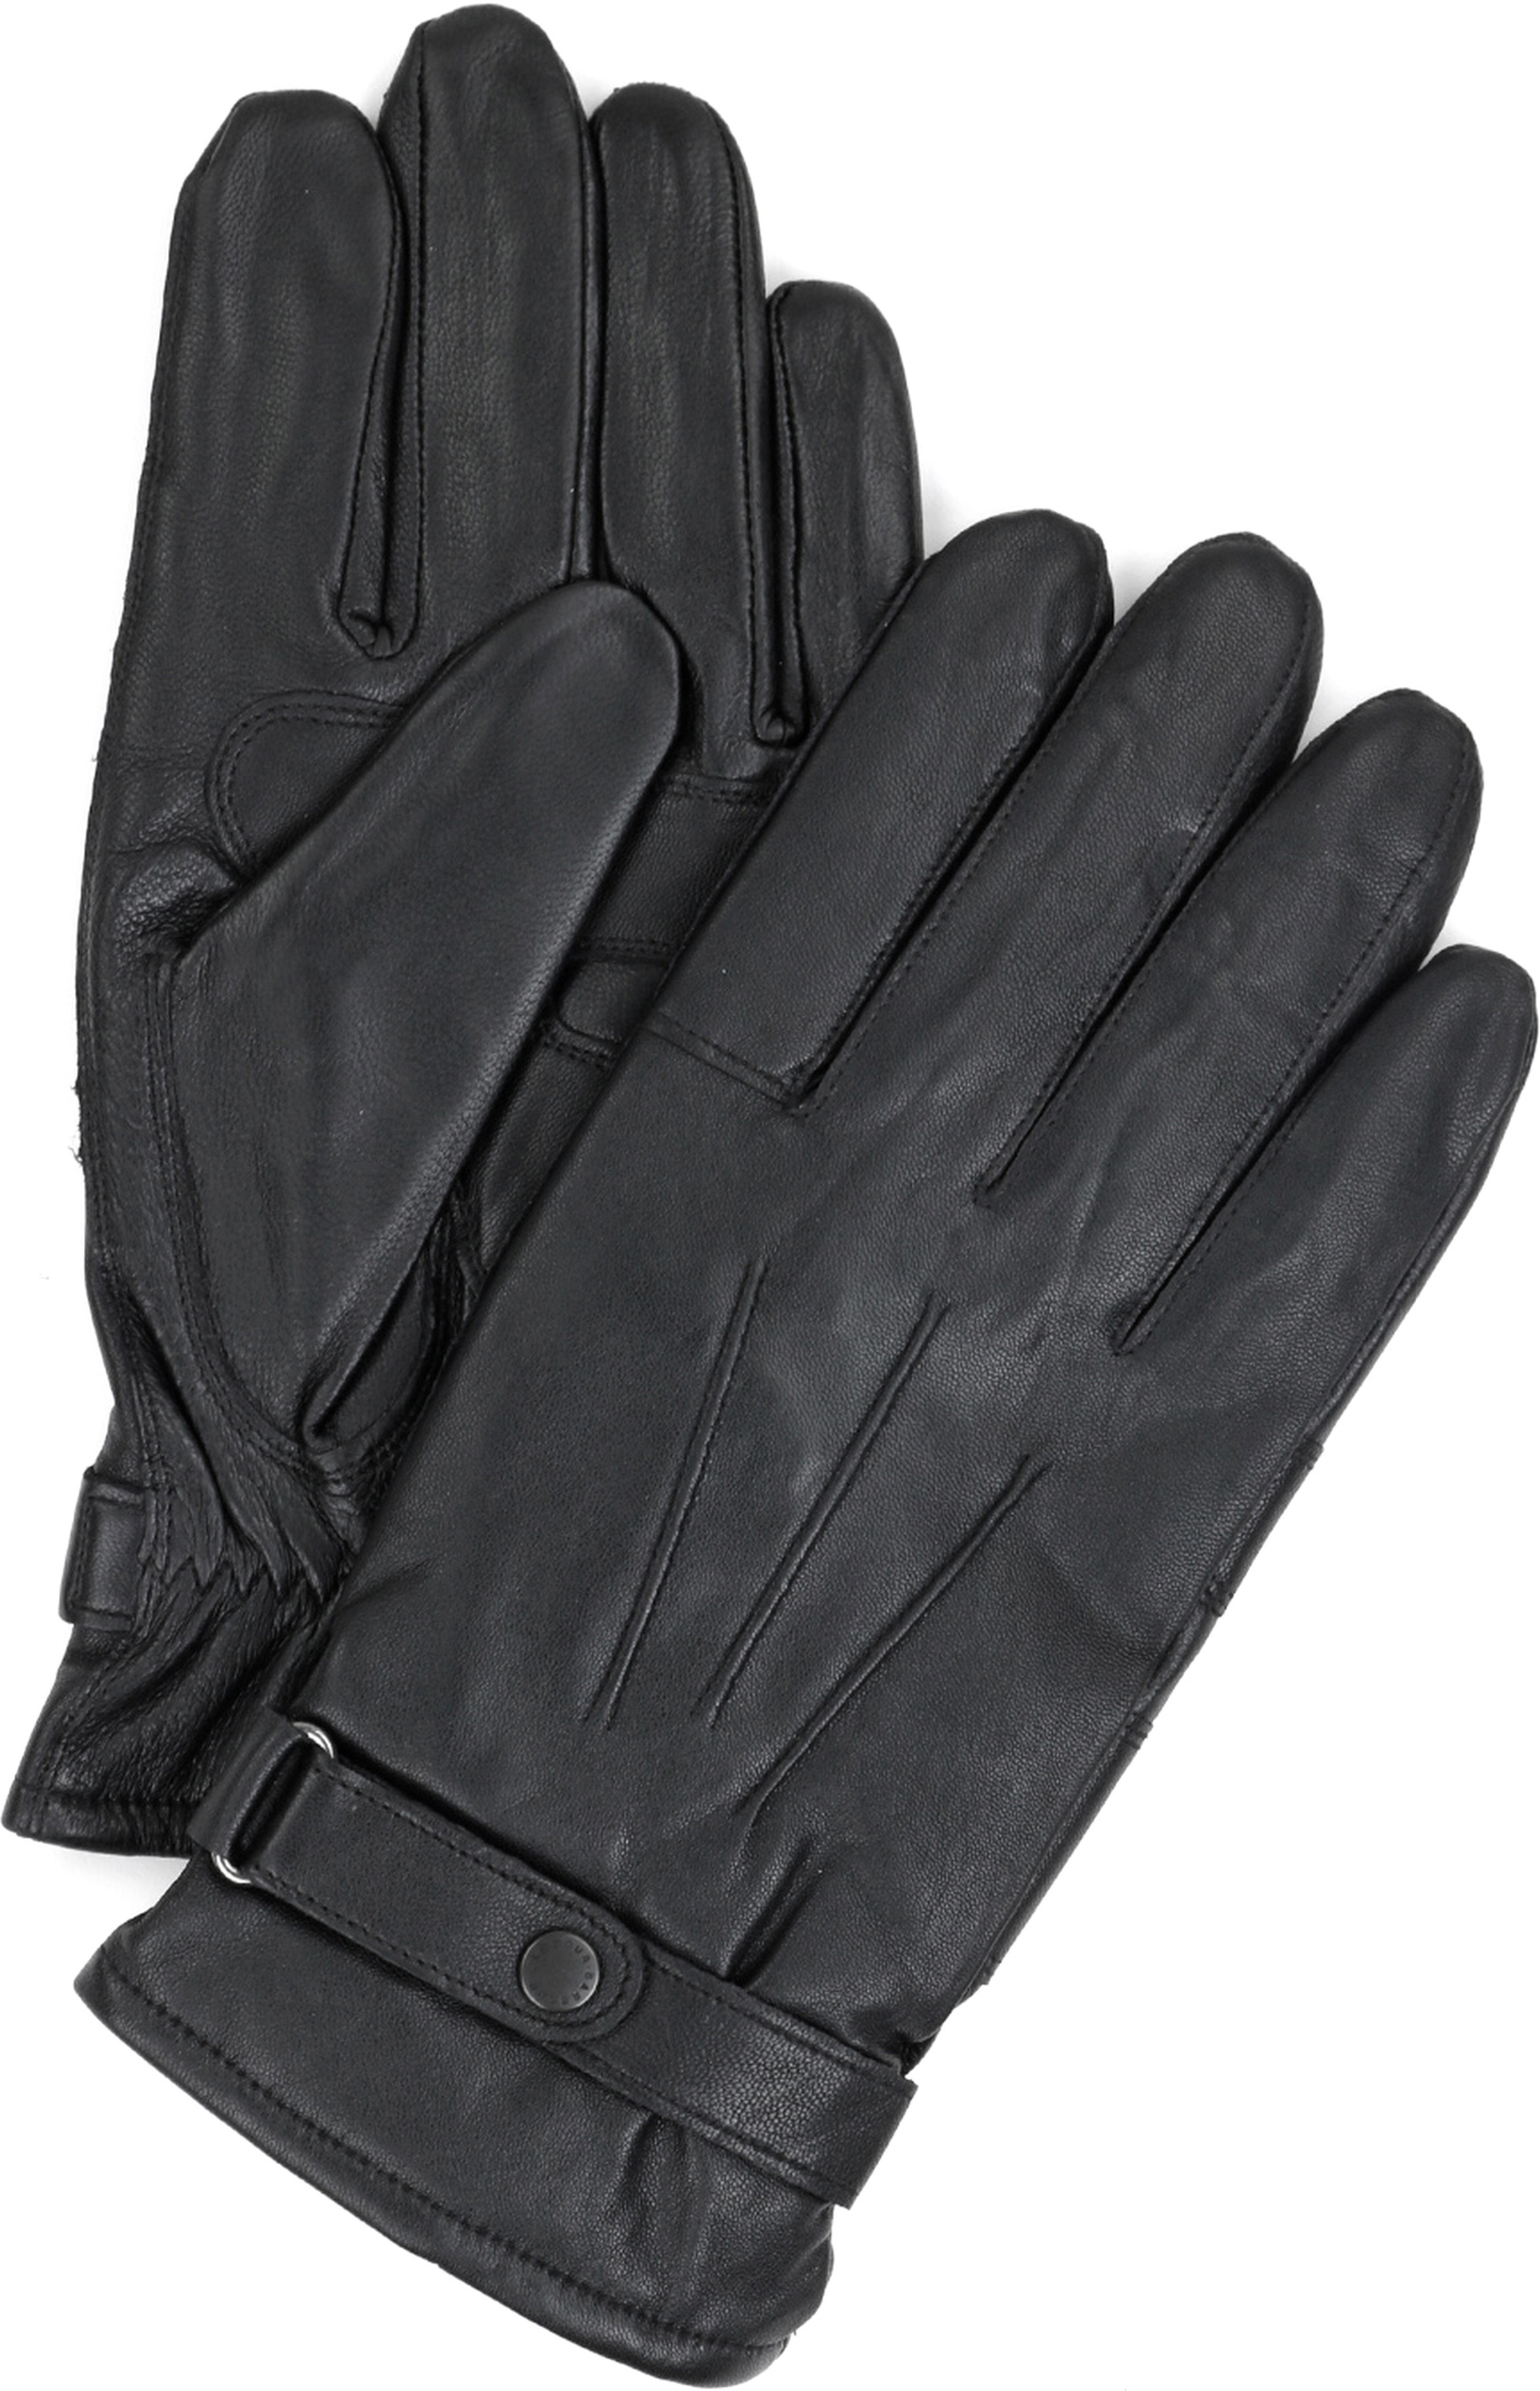 Barbour Handschuhe Glattleder Schwarz